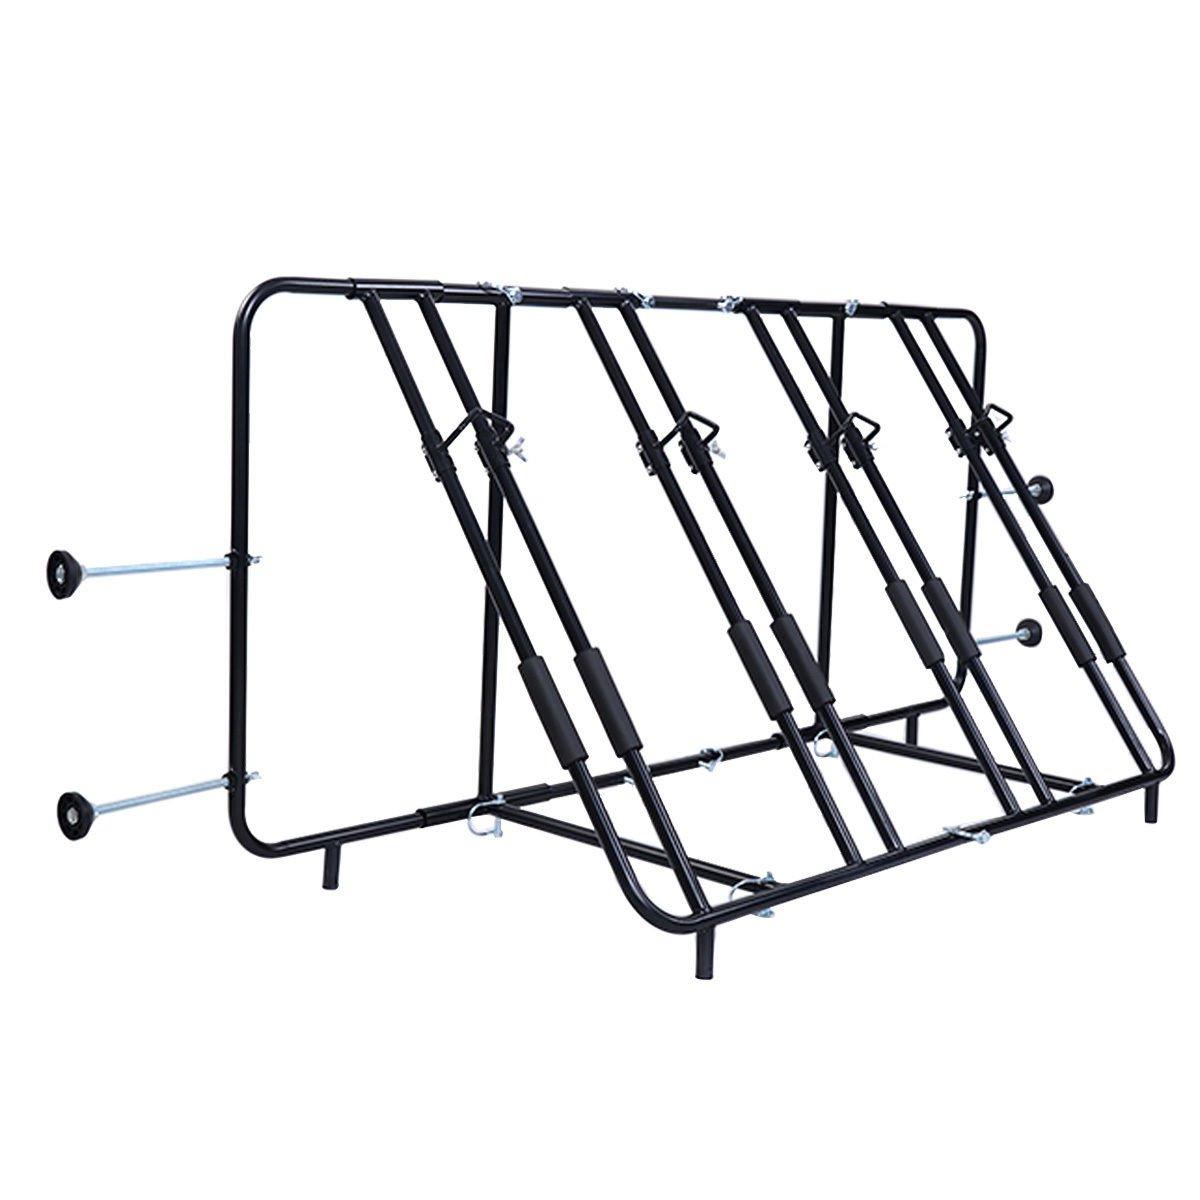 Goplus Adjustable Four Bicycle Bike Rack Truck Pick Up Bed